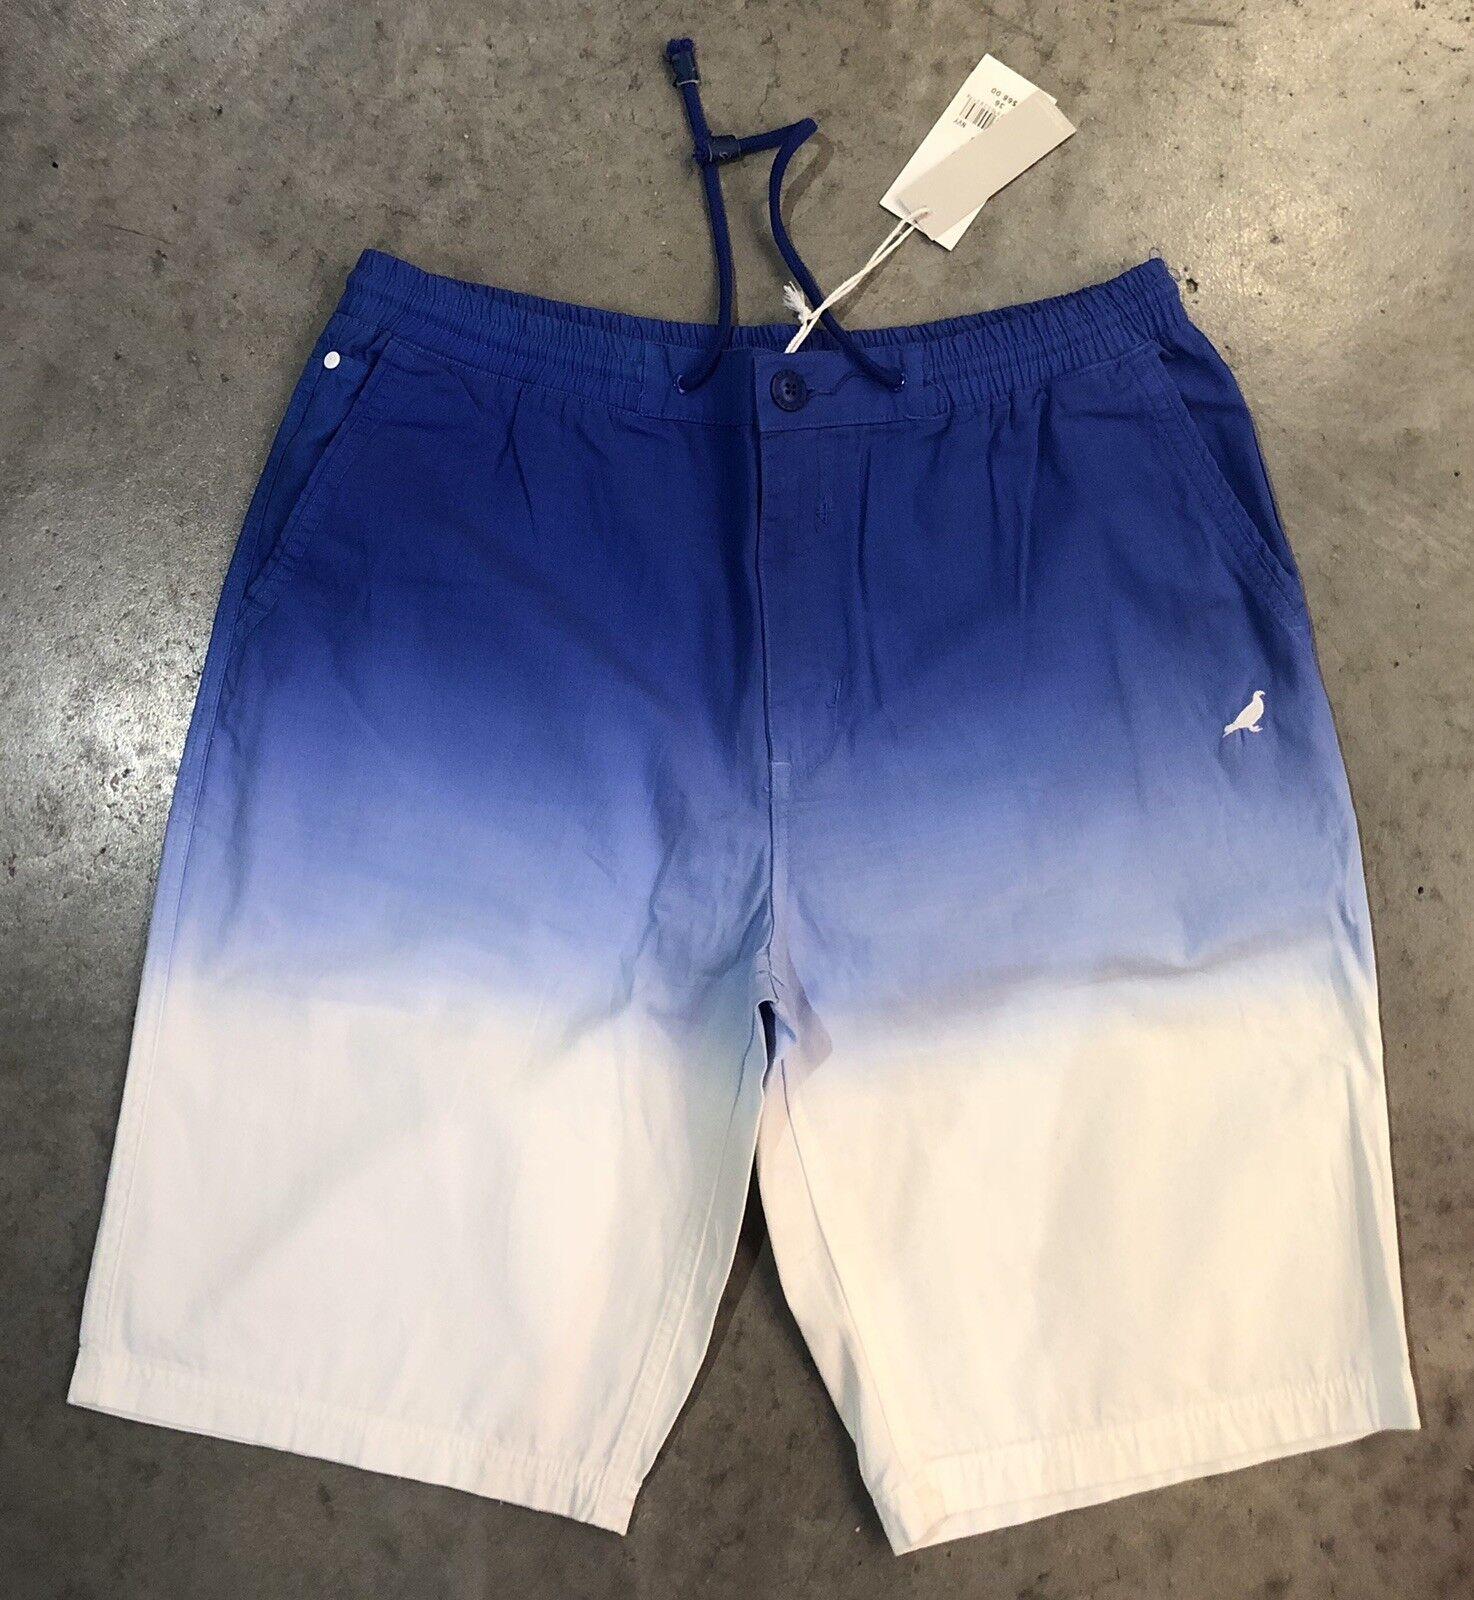 Staple Swim-Shorts In Navy Sz. 36 NWT 100% Authentic